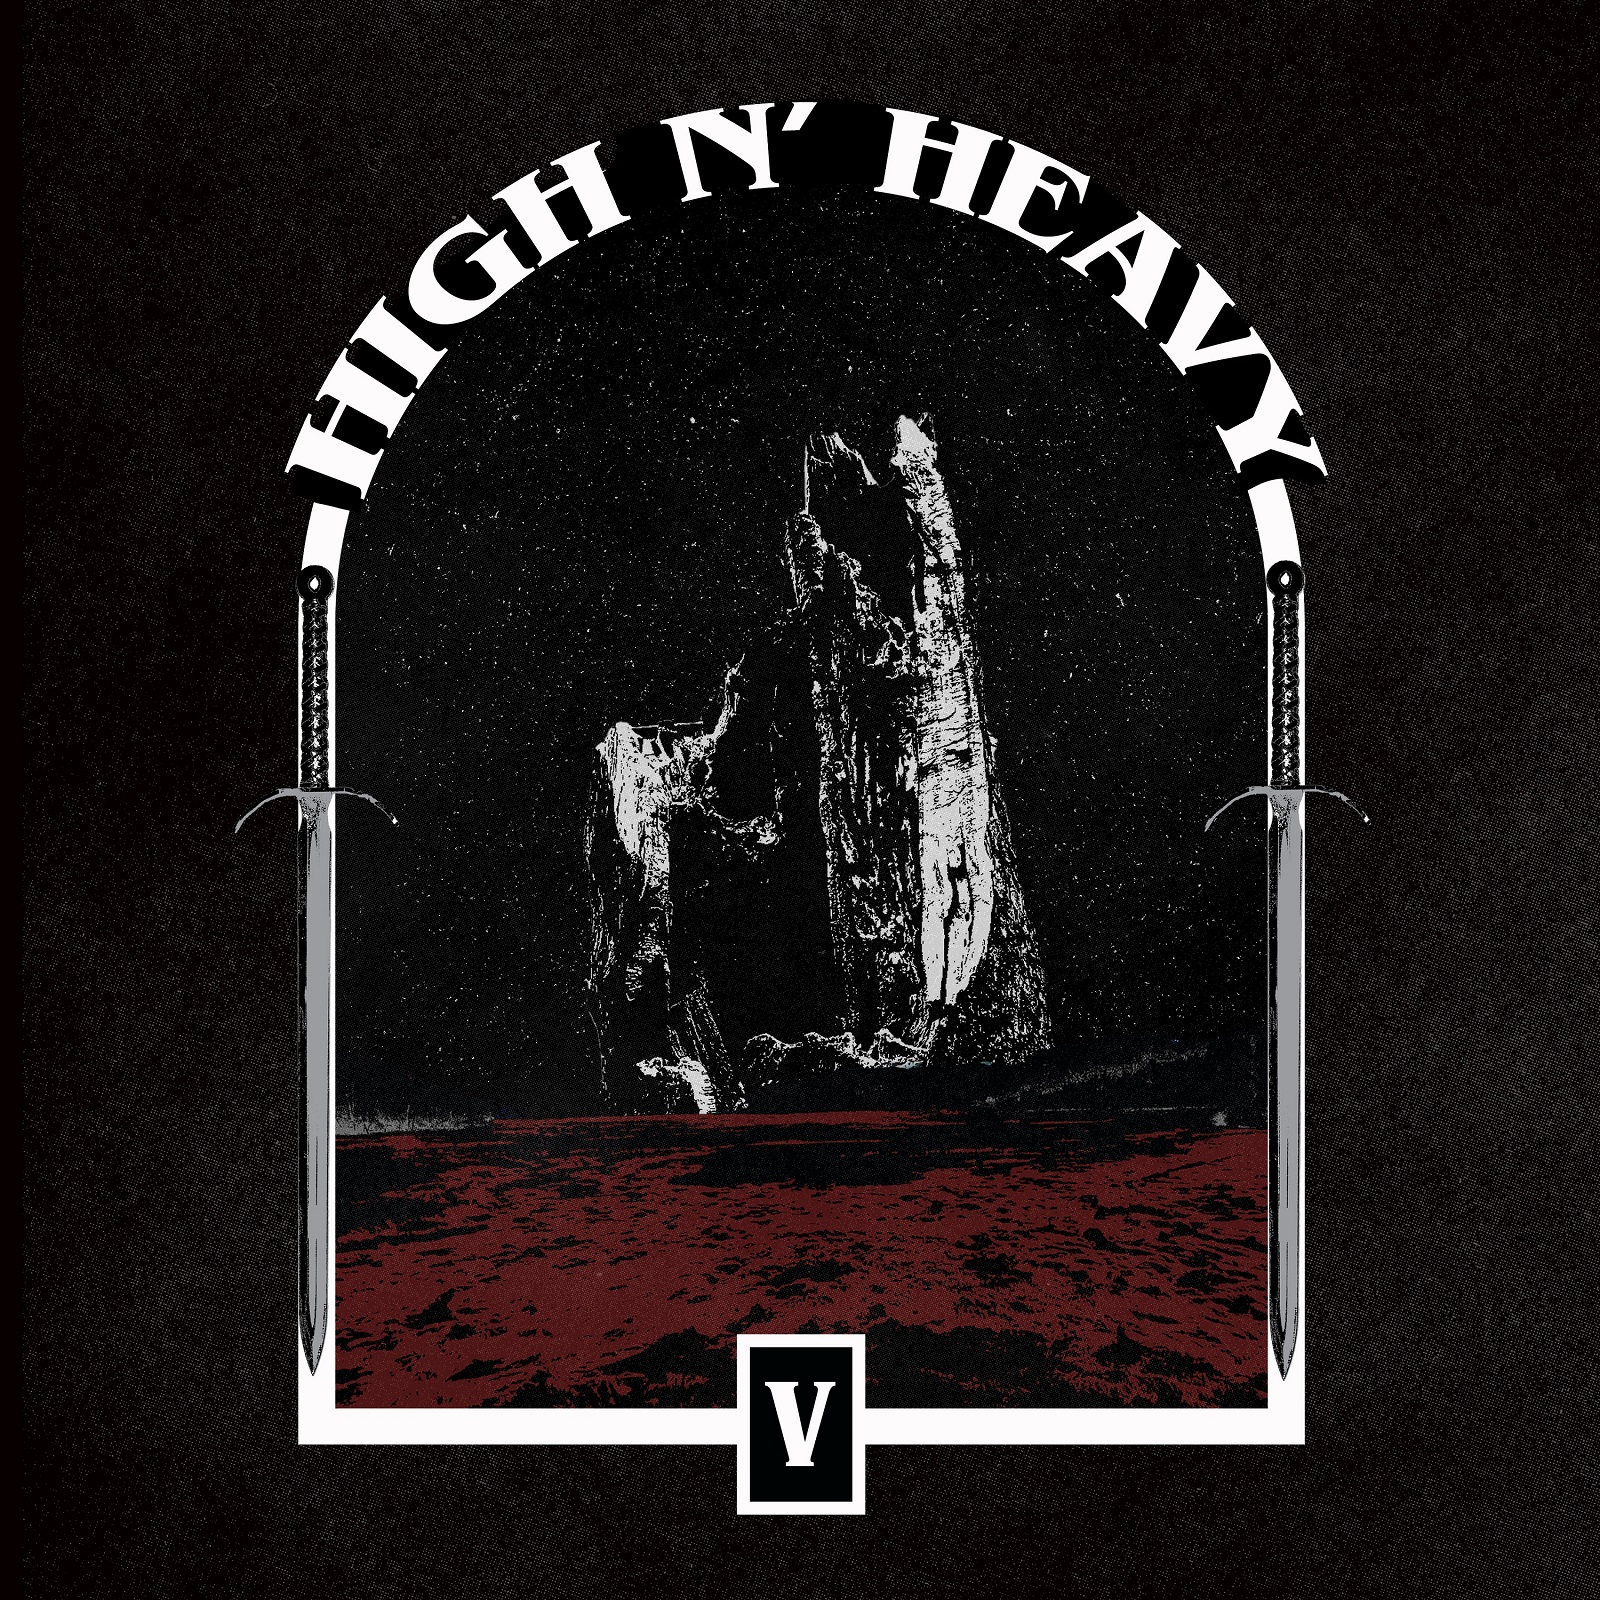 high n heavy v